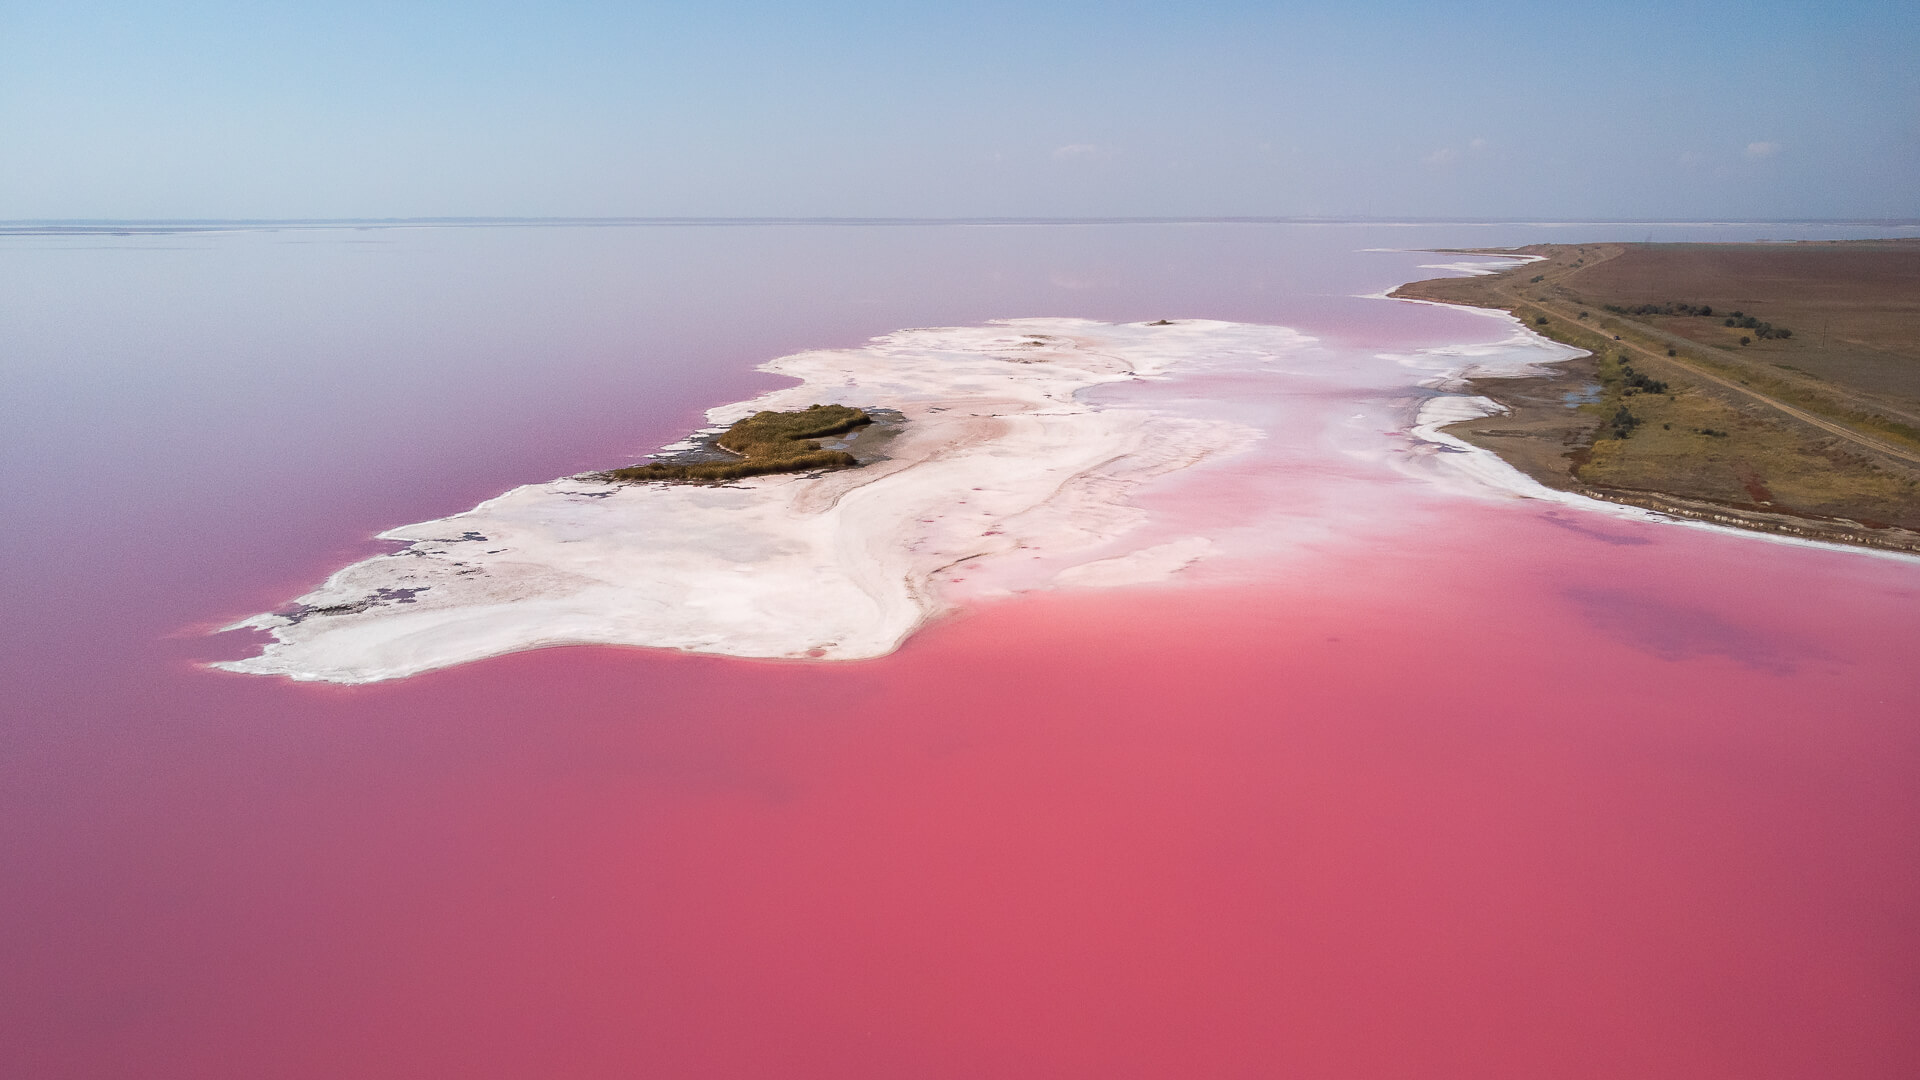 Лемурійське (Рожеве) озеро